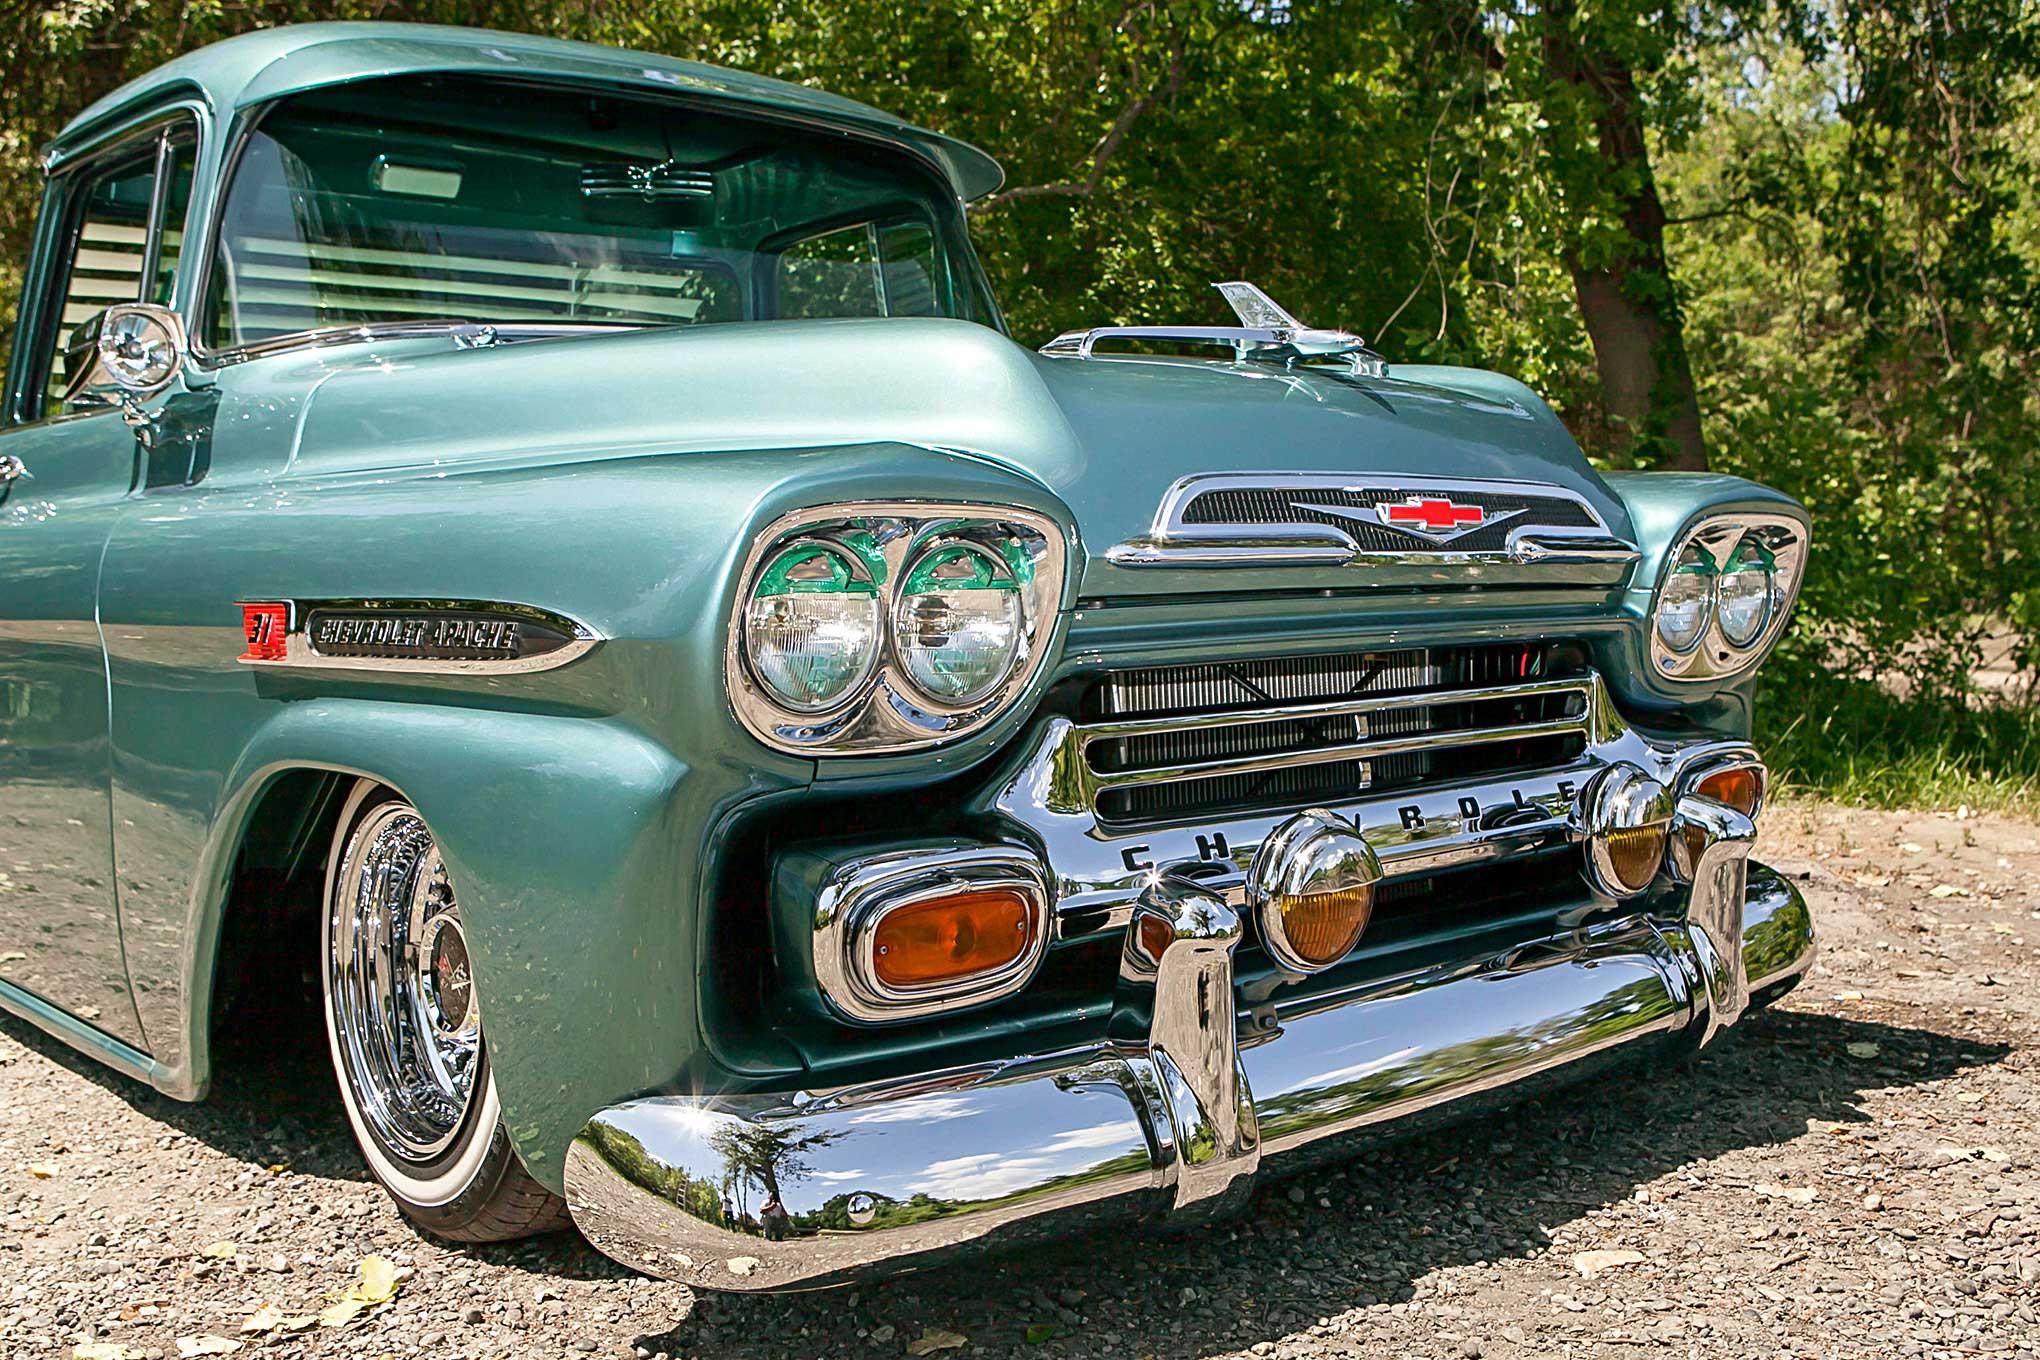 An Even Trade Produced this Badass '59 Chevy Apache